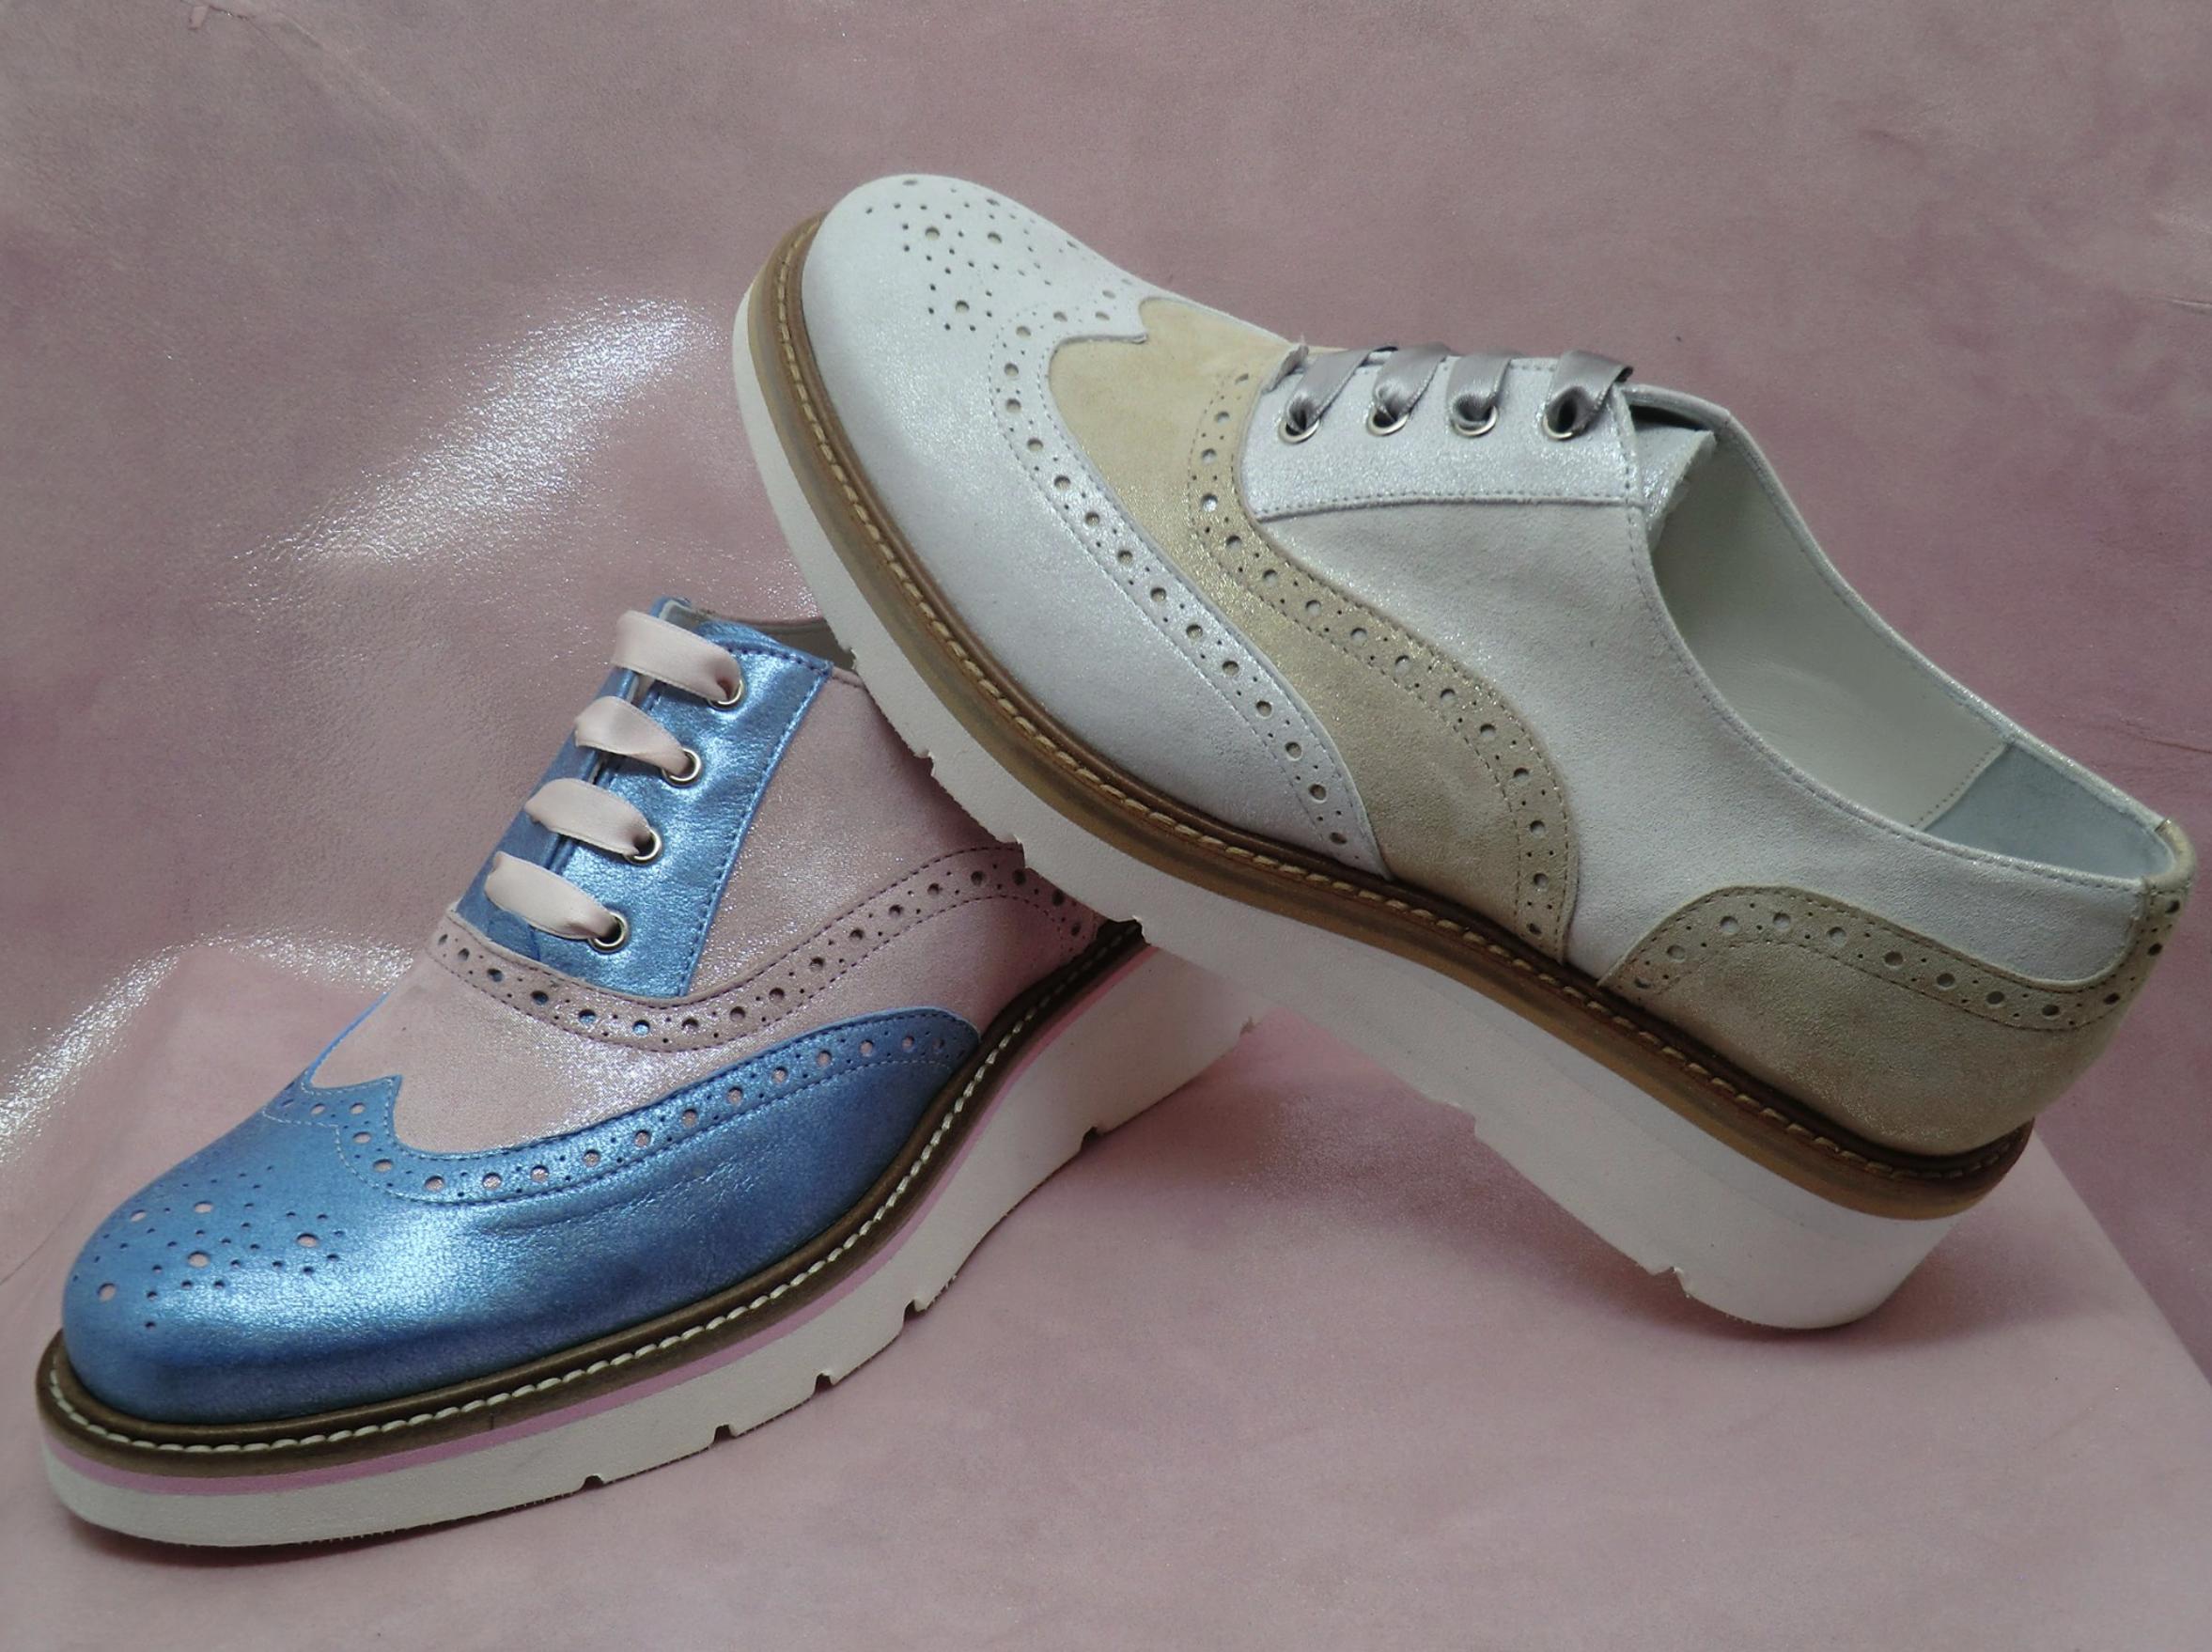 Umbers Shoes